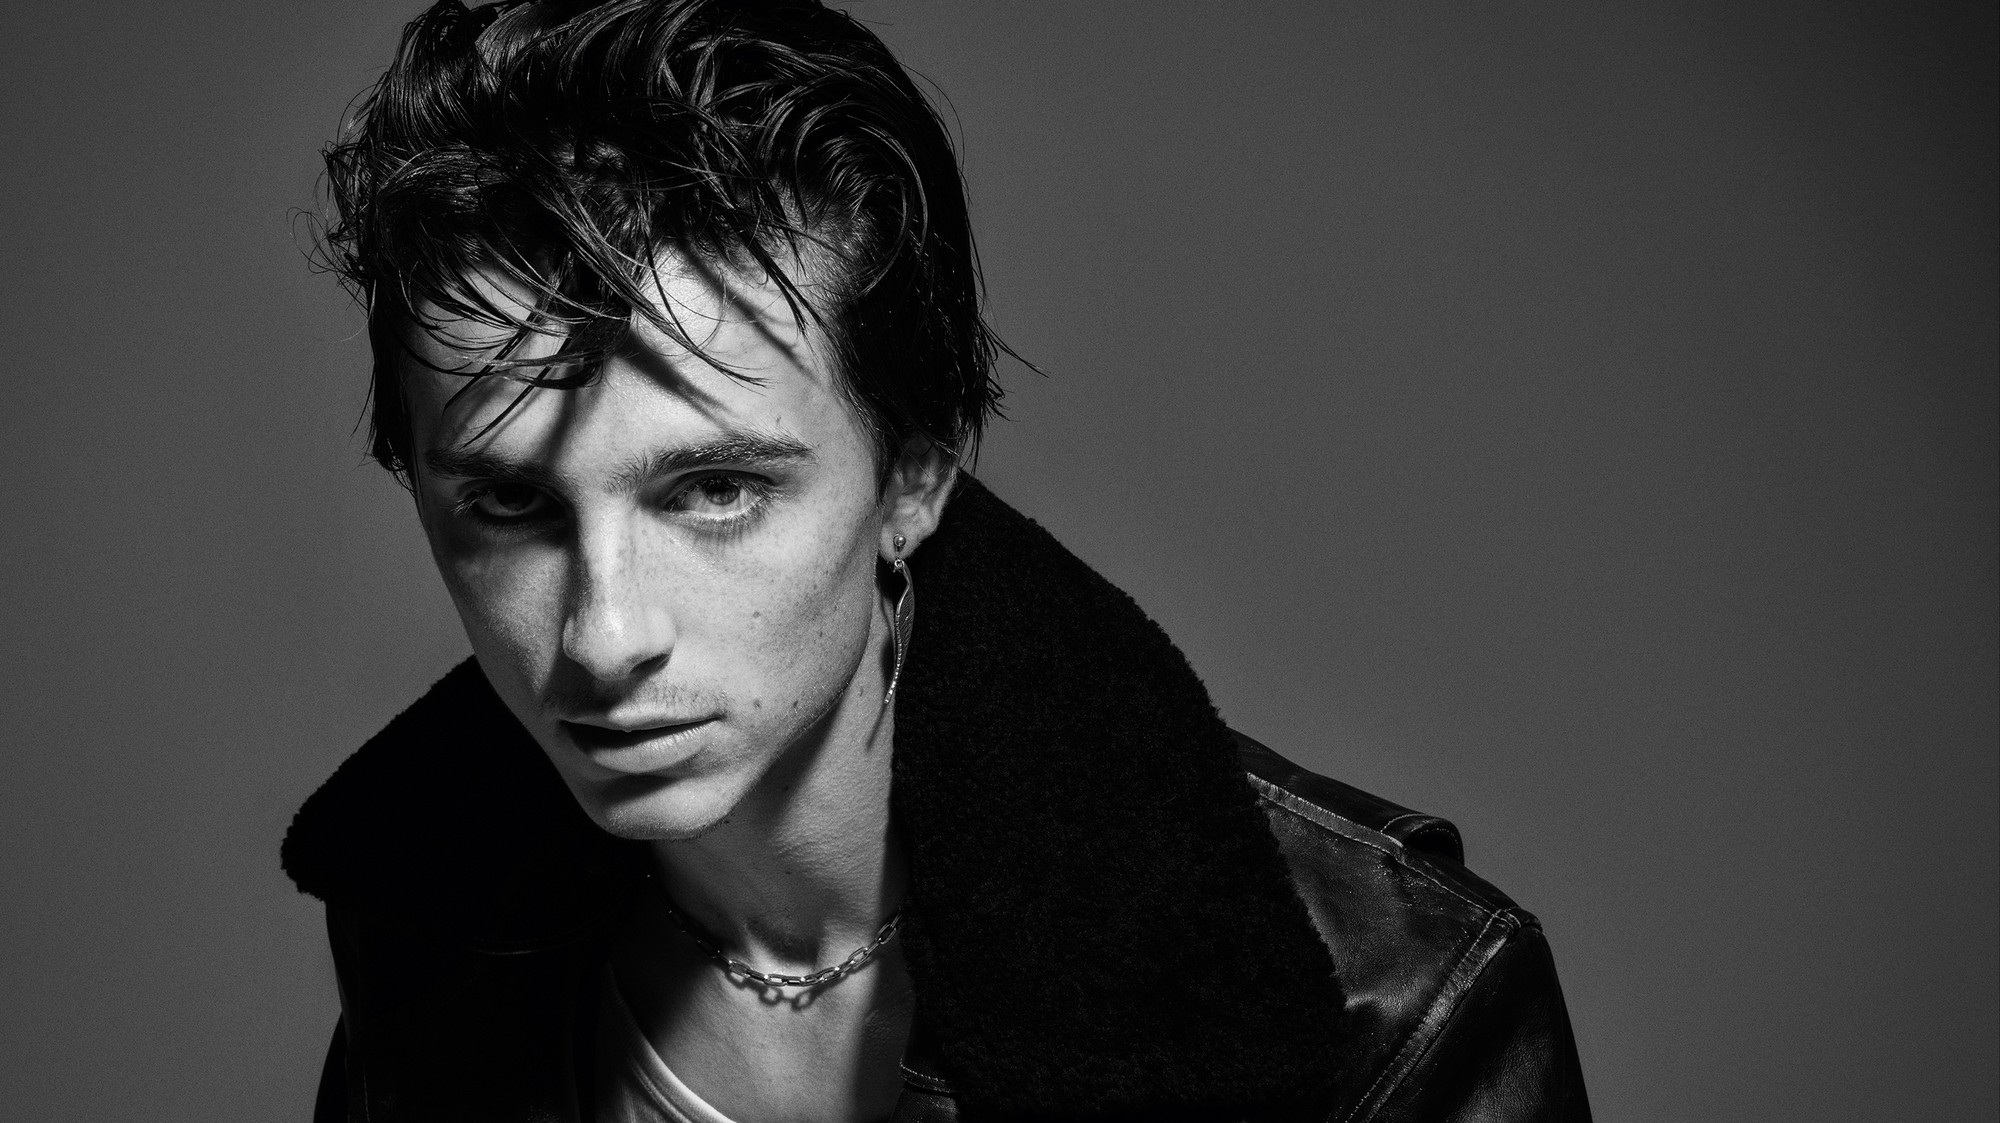 Harry Styles interviews Timothée Chalamet for i-D: read the